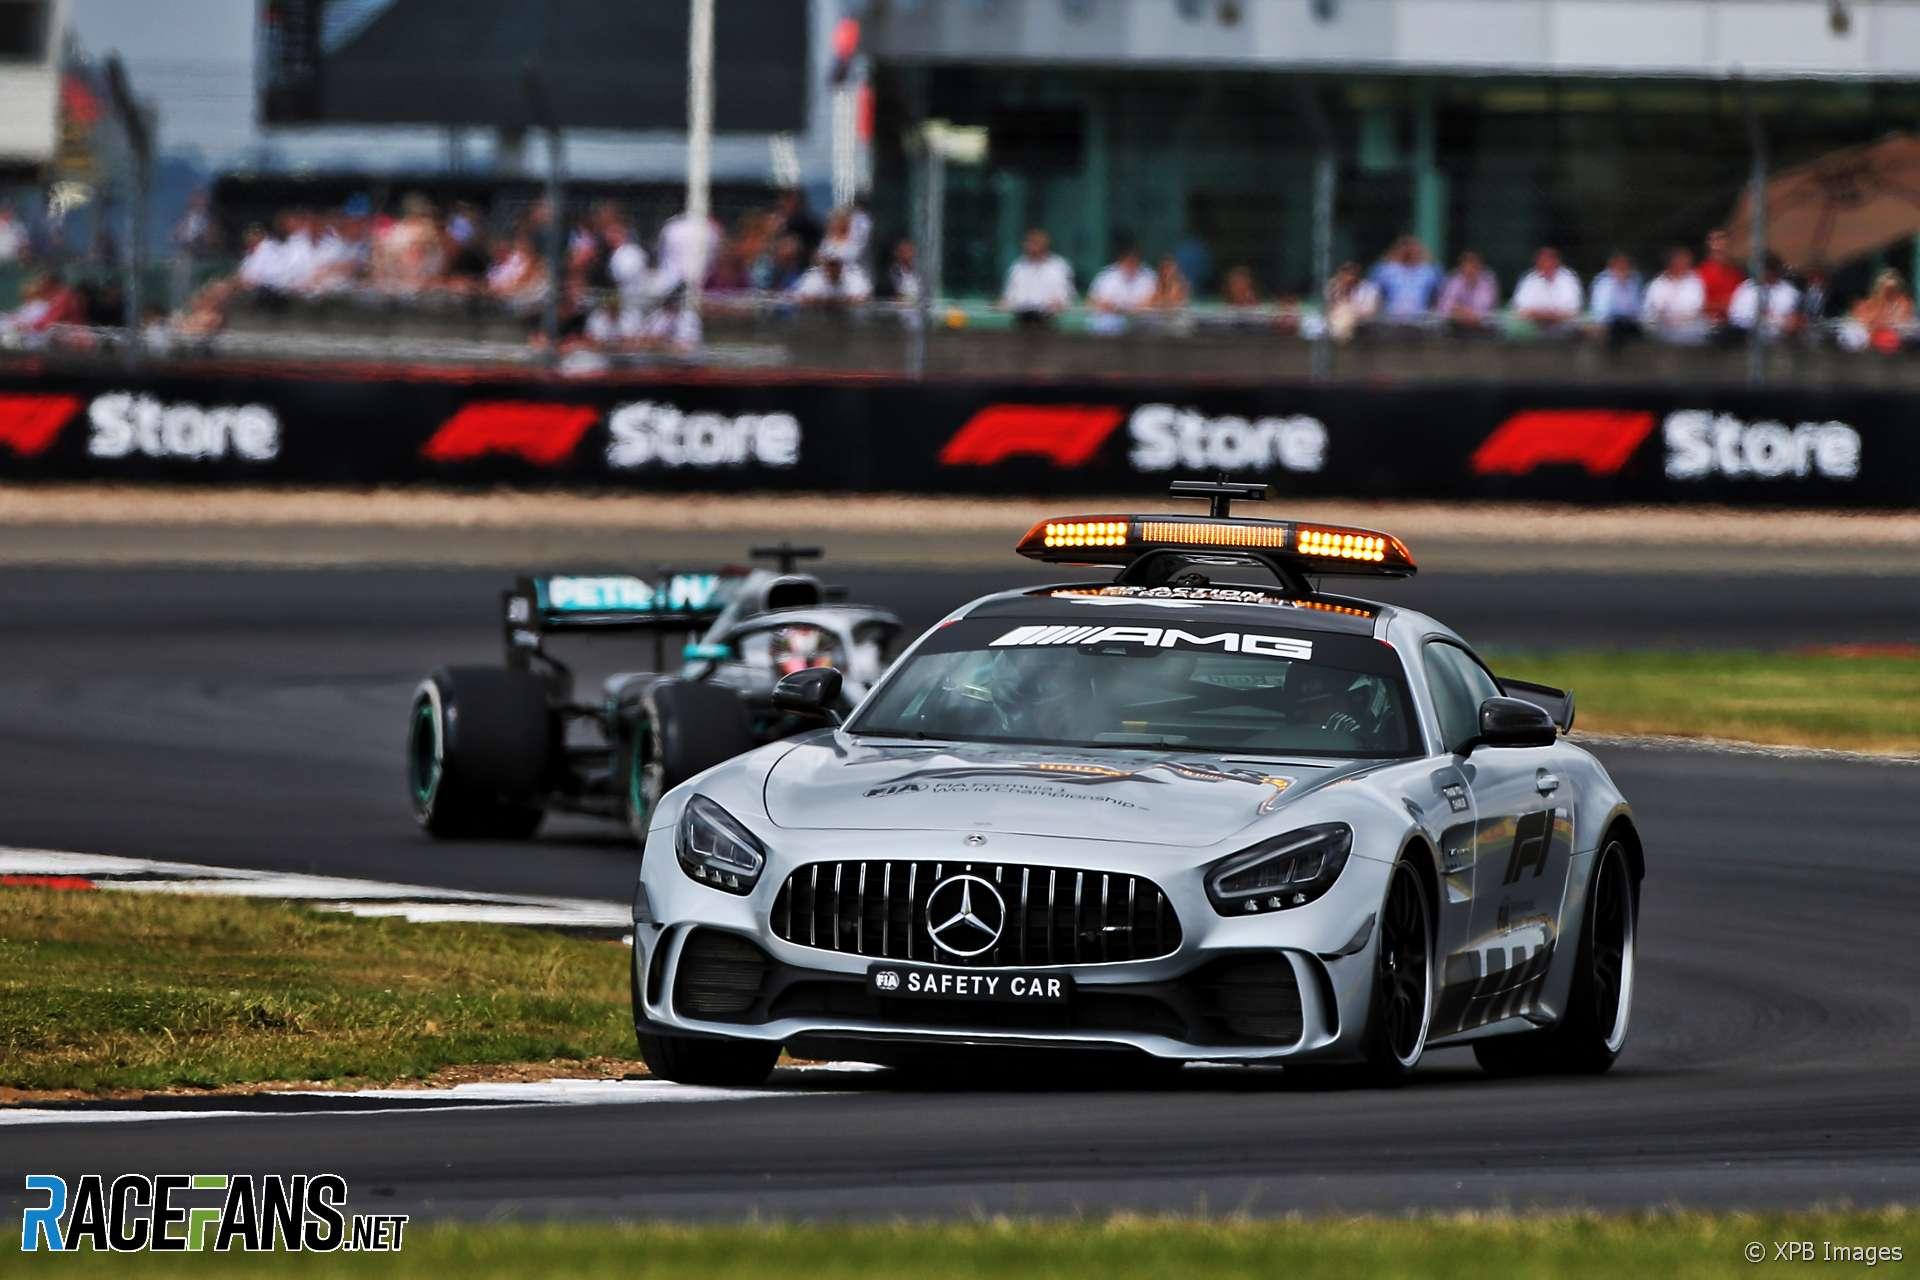 F1: Lewis Hamilton says Safety Car didn't win him the race